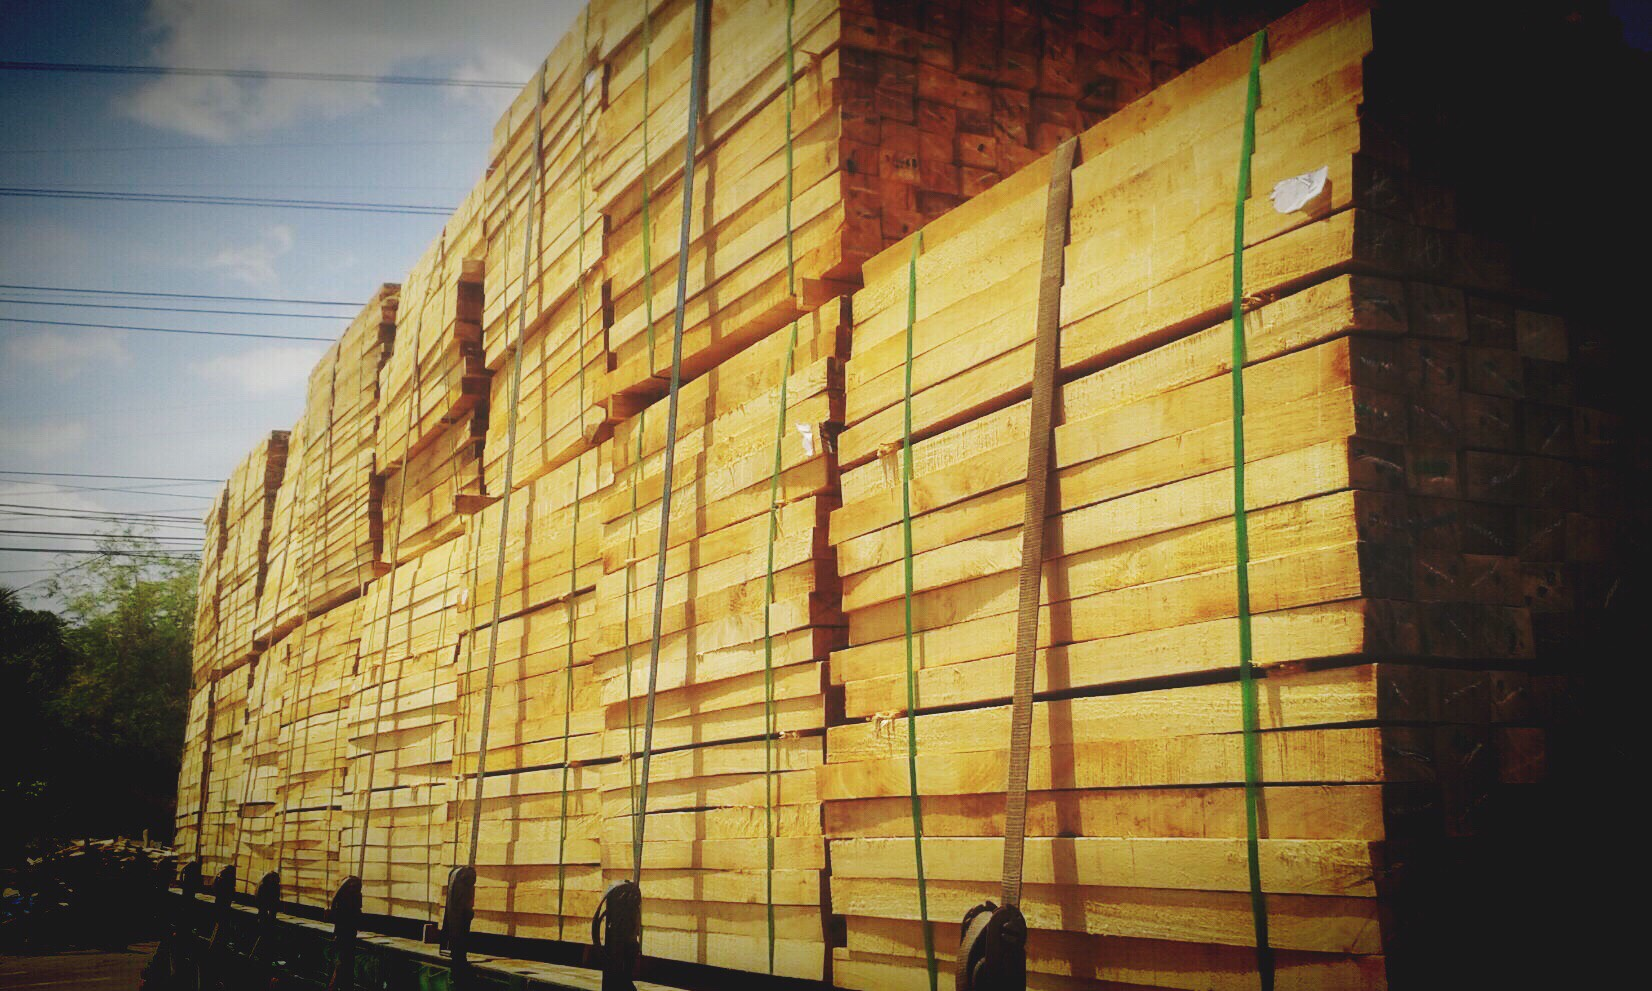 SIAM PACKING CENTER | เป็นผู้ผลิตและจำหน่าย พาเลทไม้ ลังทึบ ลังโปร่ง ฐานเครื่องจักรโรงงาน ไม้ท่อนรองสินค้า Stopper แท่นรองสินค้าและวัสดุแพ็คเกจจิ้งประเภทไม้ทุกชนิด